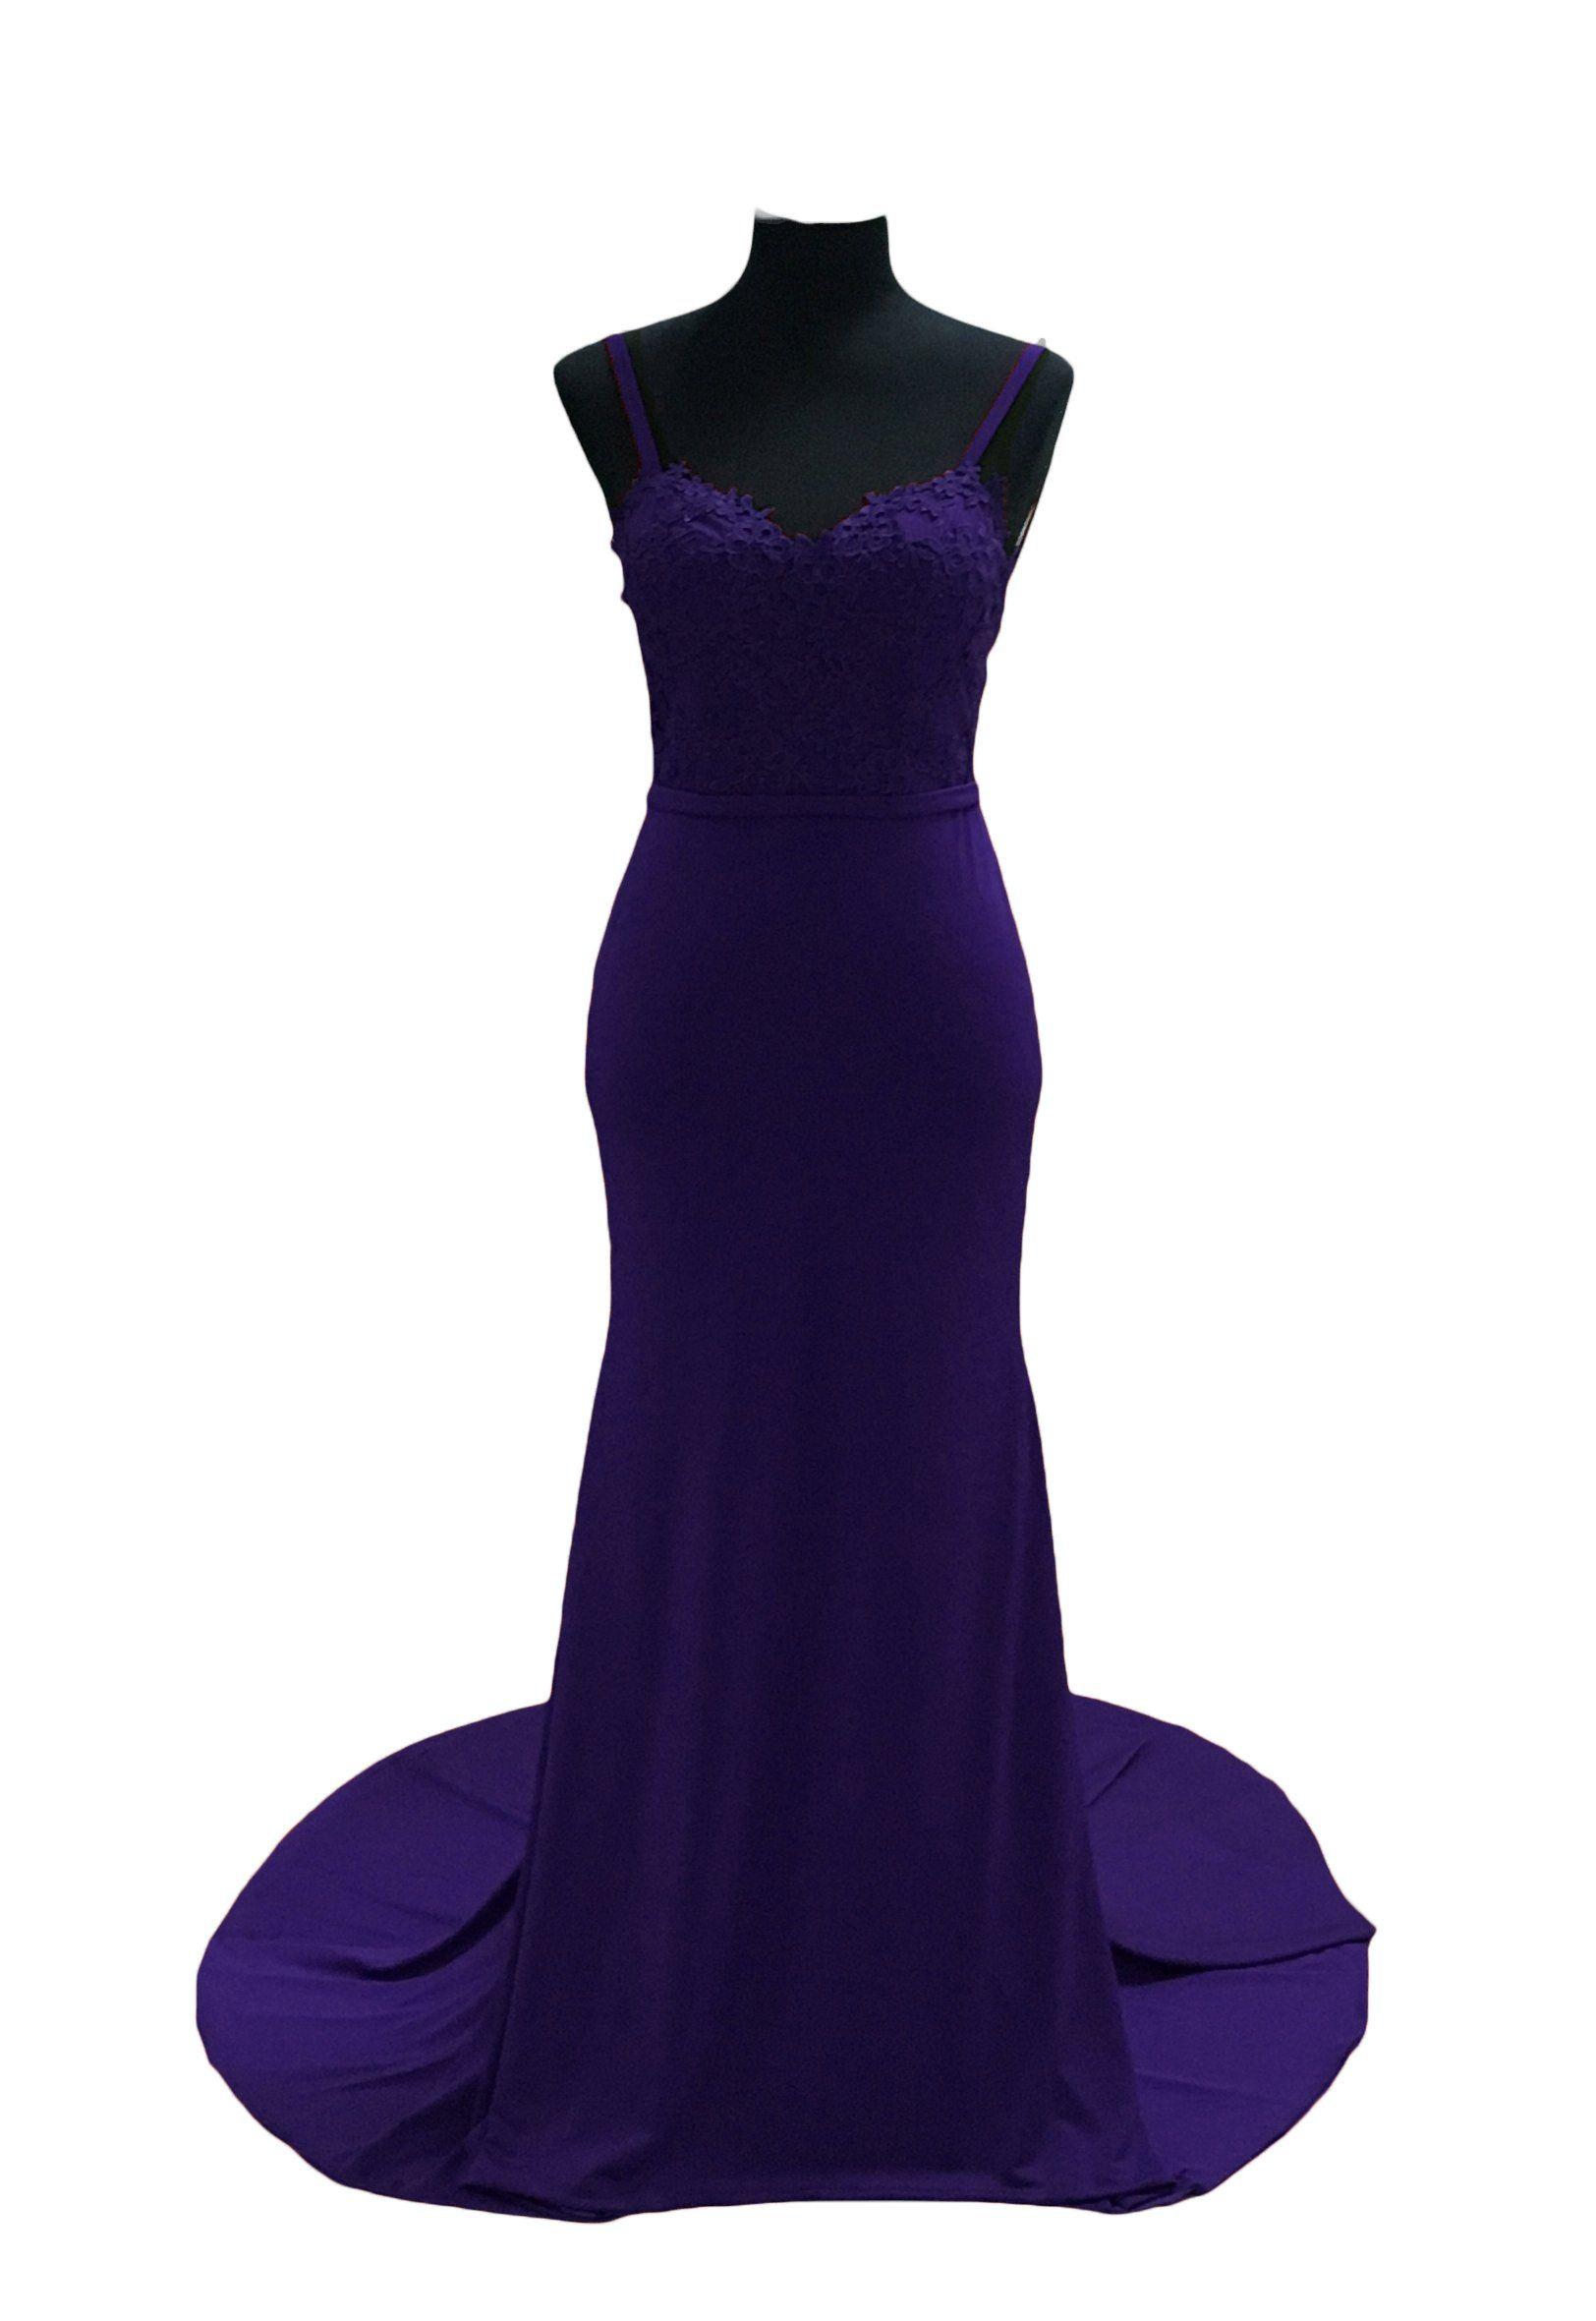 Asa bridal womenus sweetheart mermaid burgundy prom dress evening